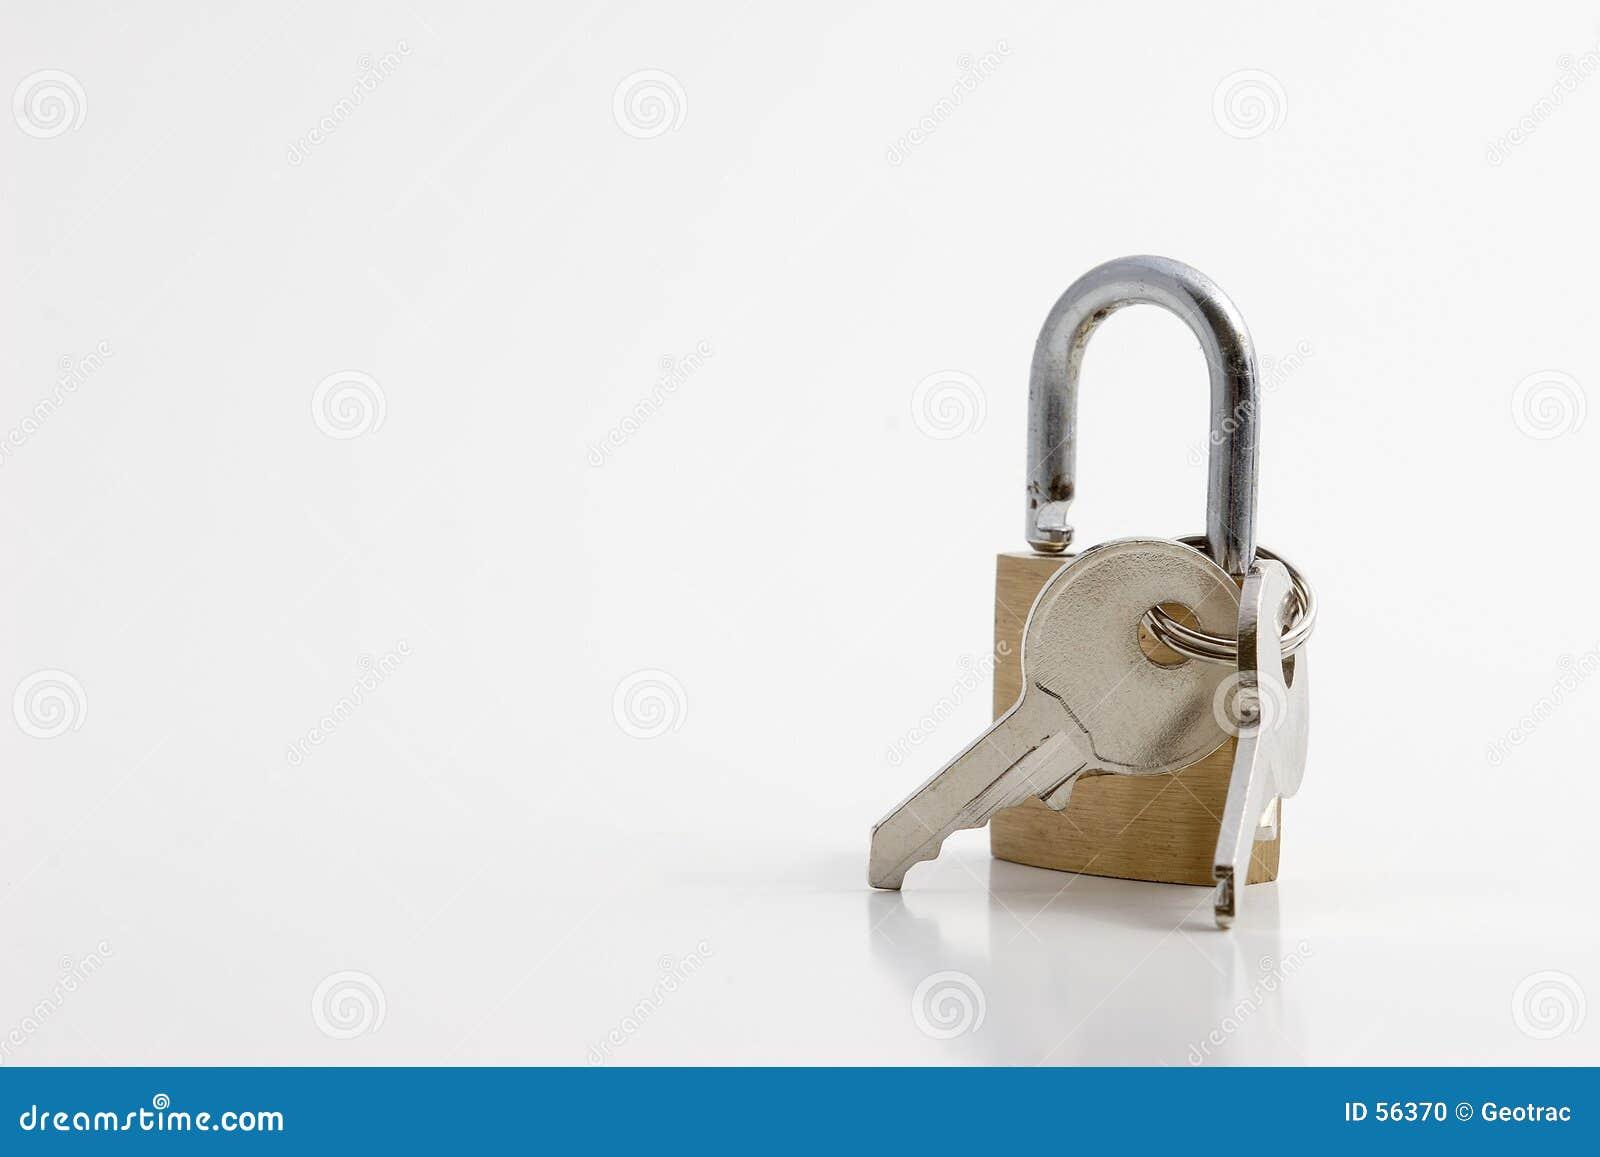 Un bloqueo con claves